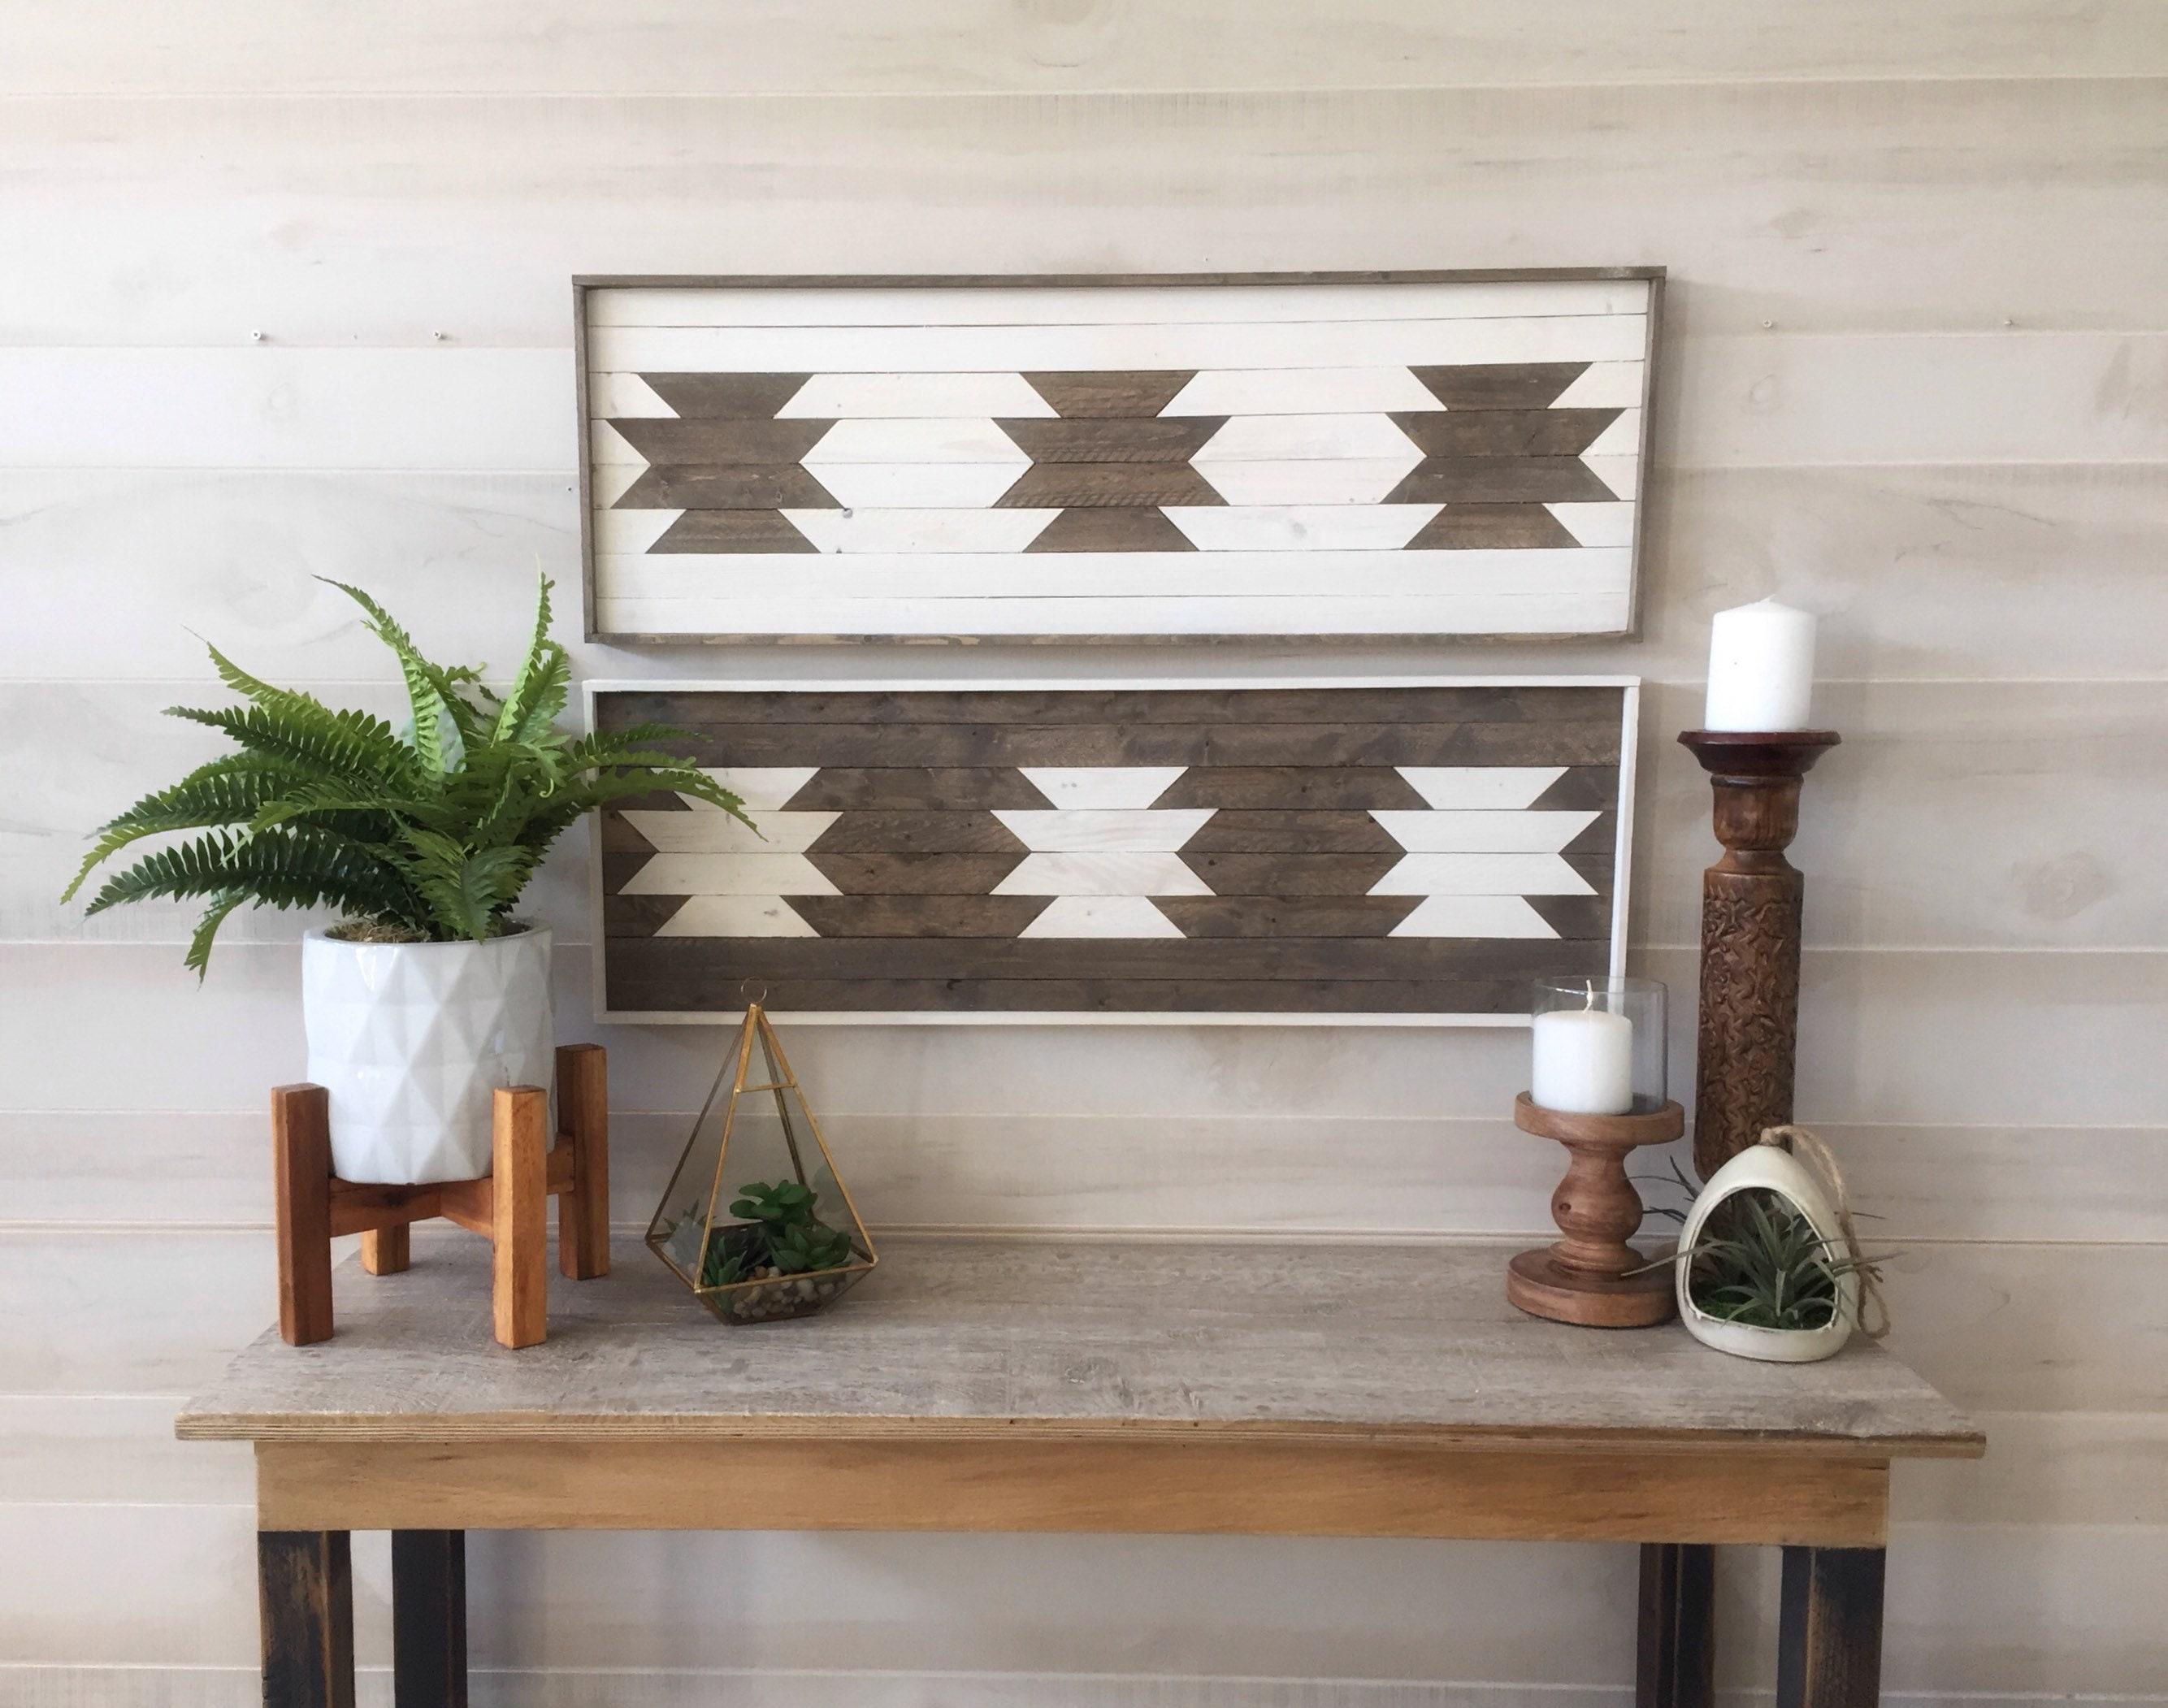 Wood wall art, reclaimed wood wall art, aztec art, living room decor ...